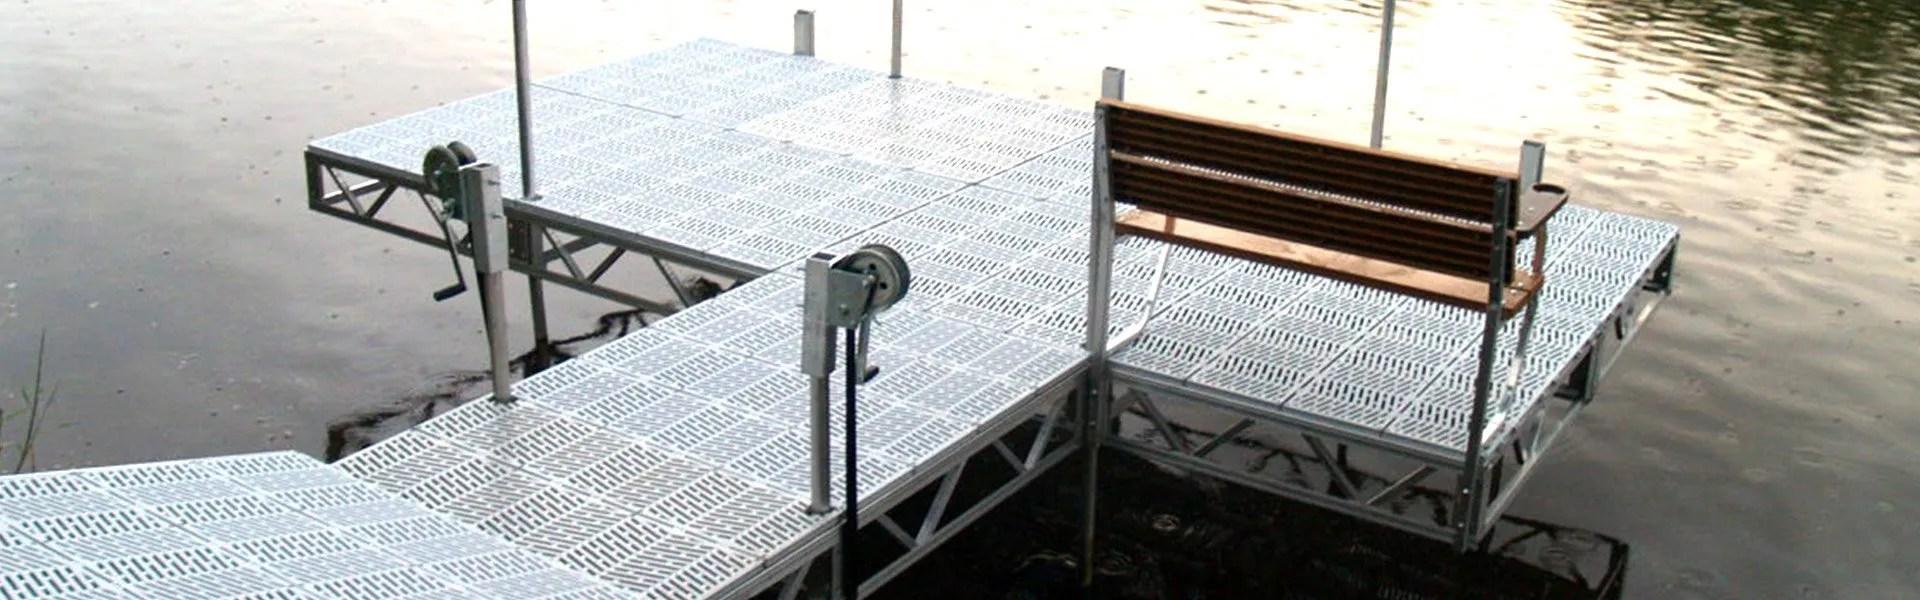 Diy kit docks ridgeline manufacturing creating high quality diy kit docks solutioingenieria Gallery